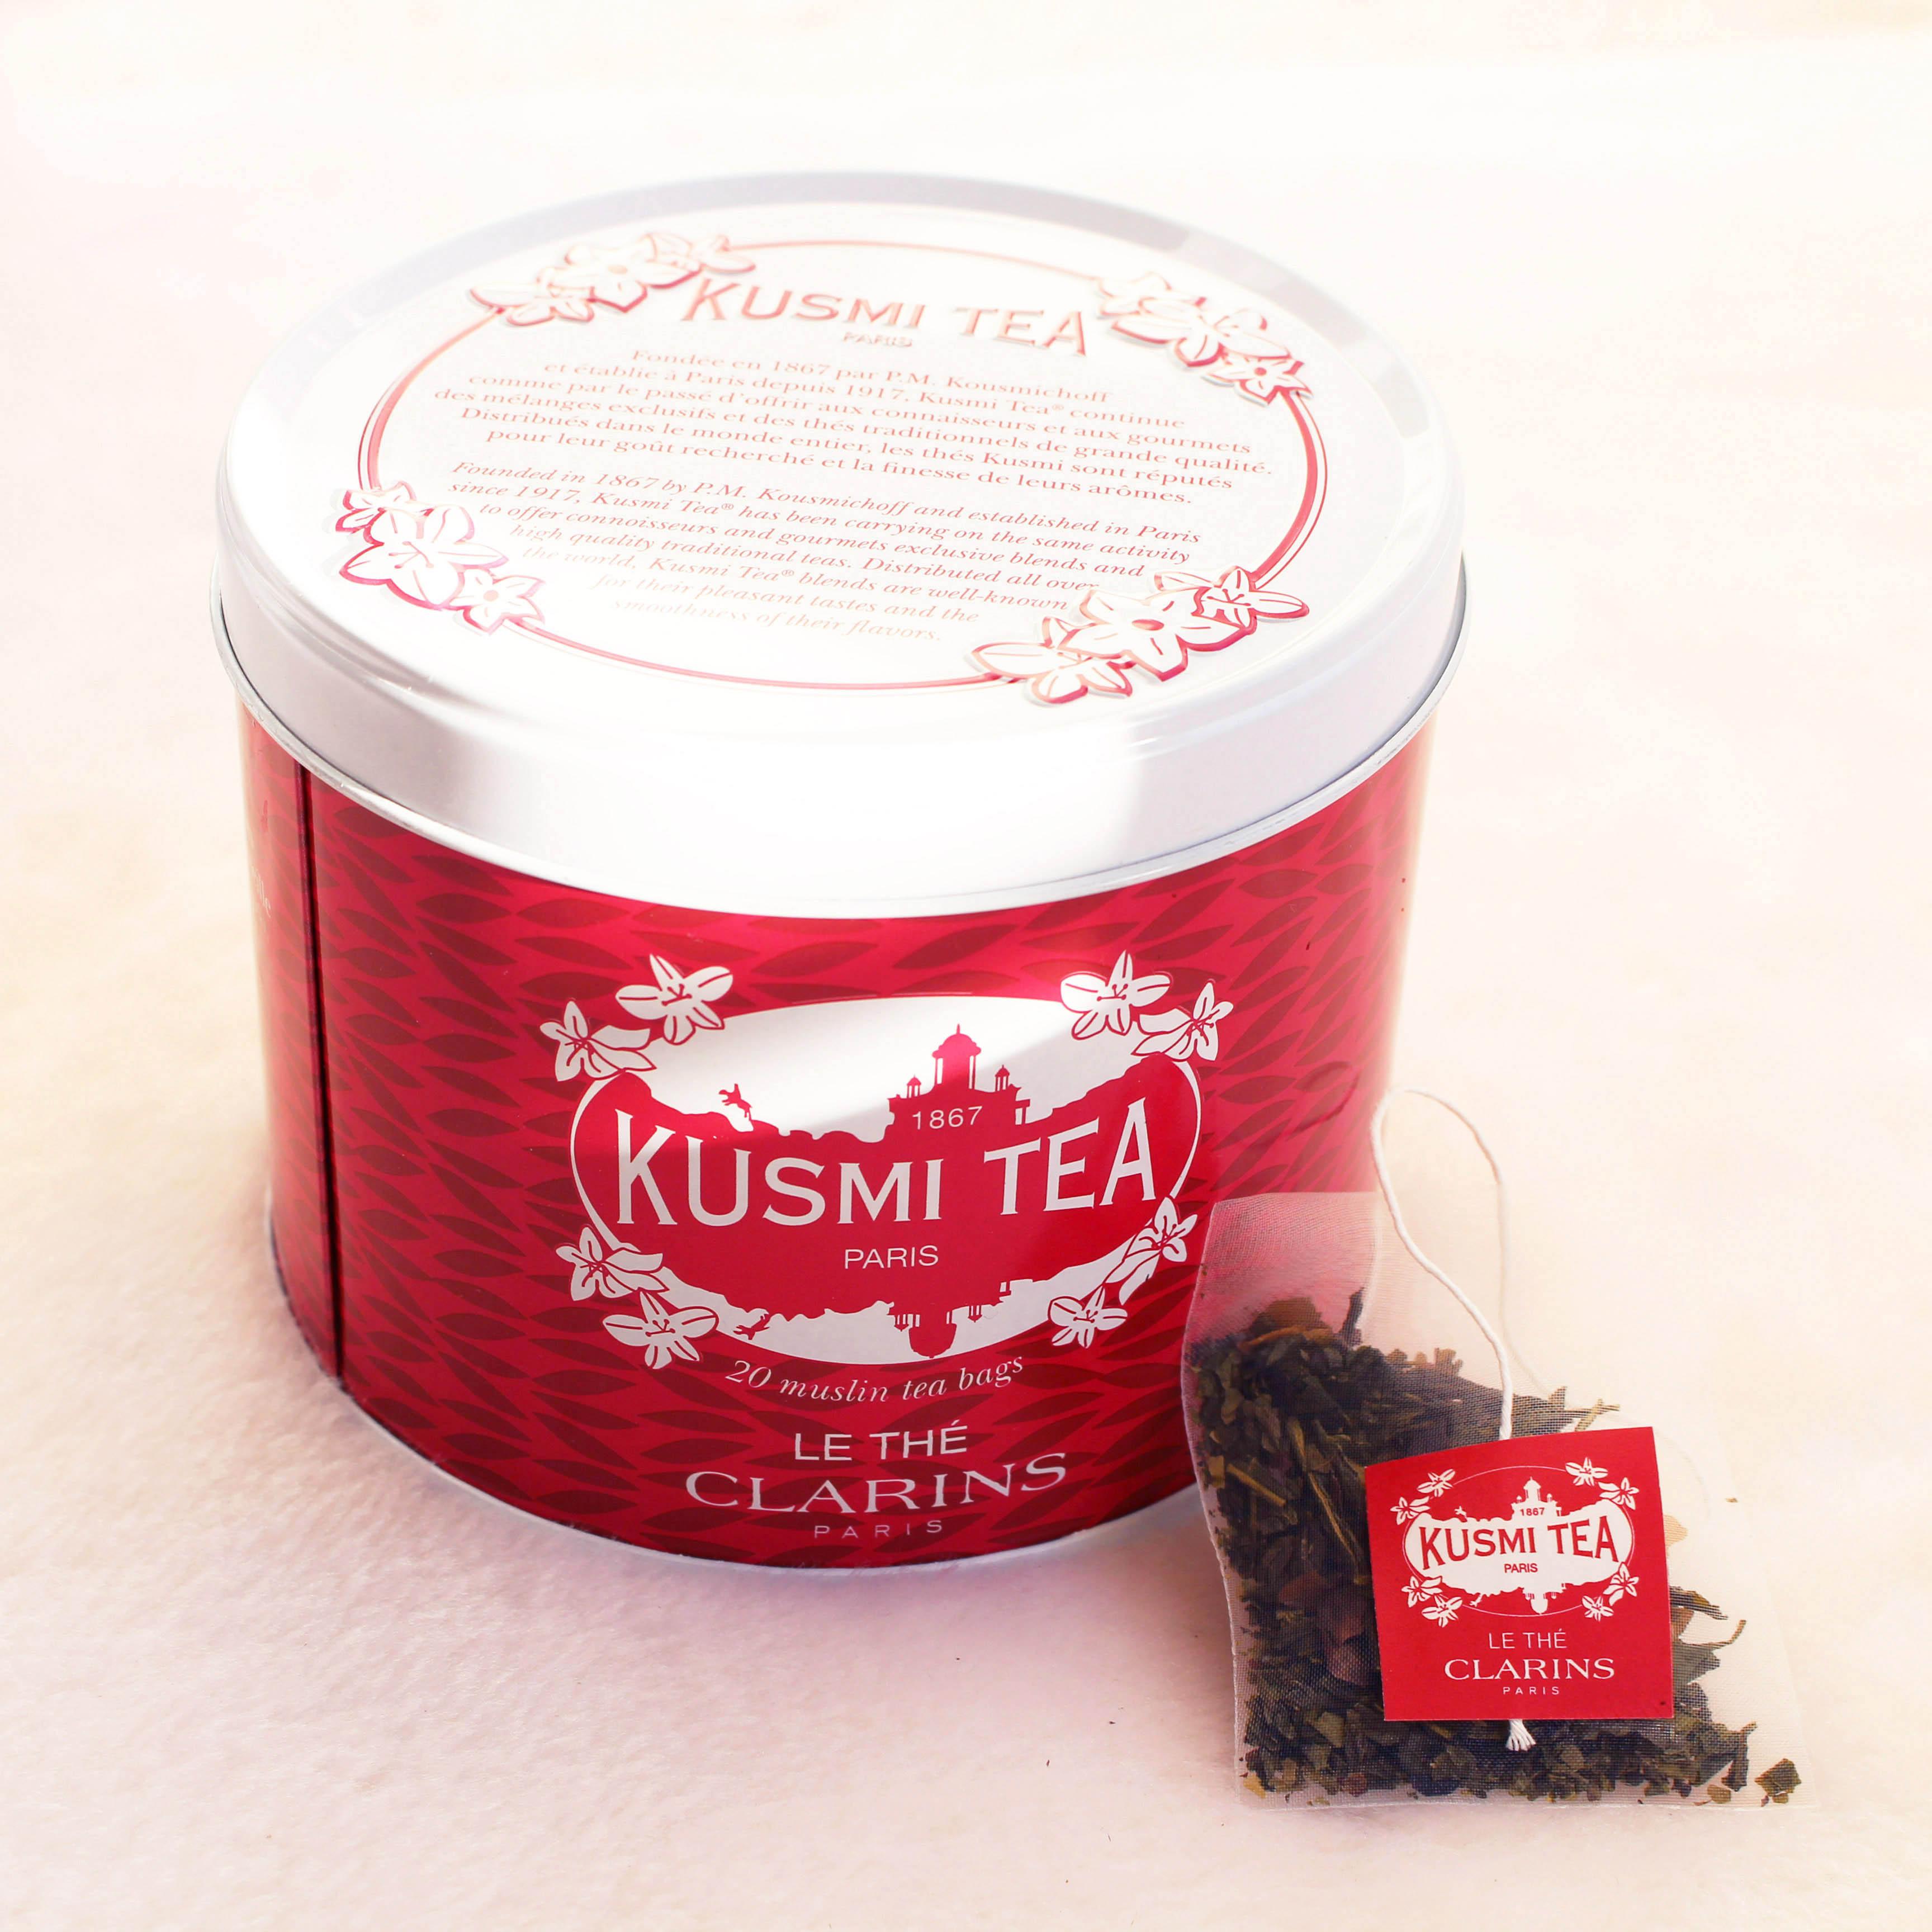 ma rentr e d tox avec le th kusmi tea x clarins dans mon sac de fille. Black Bedroom Furniture Sets. Home Design Ideas